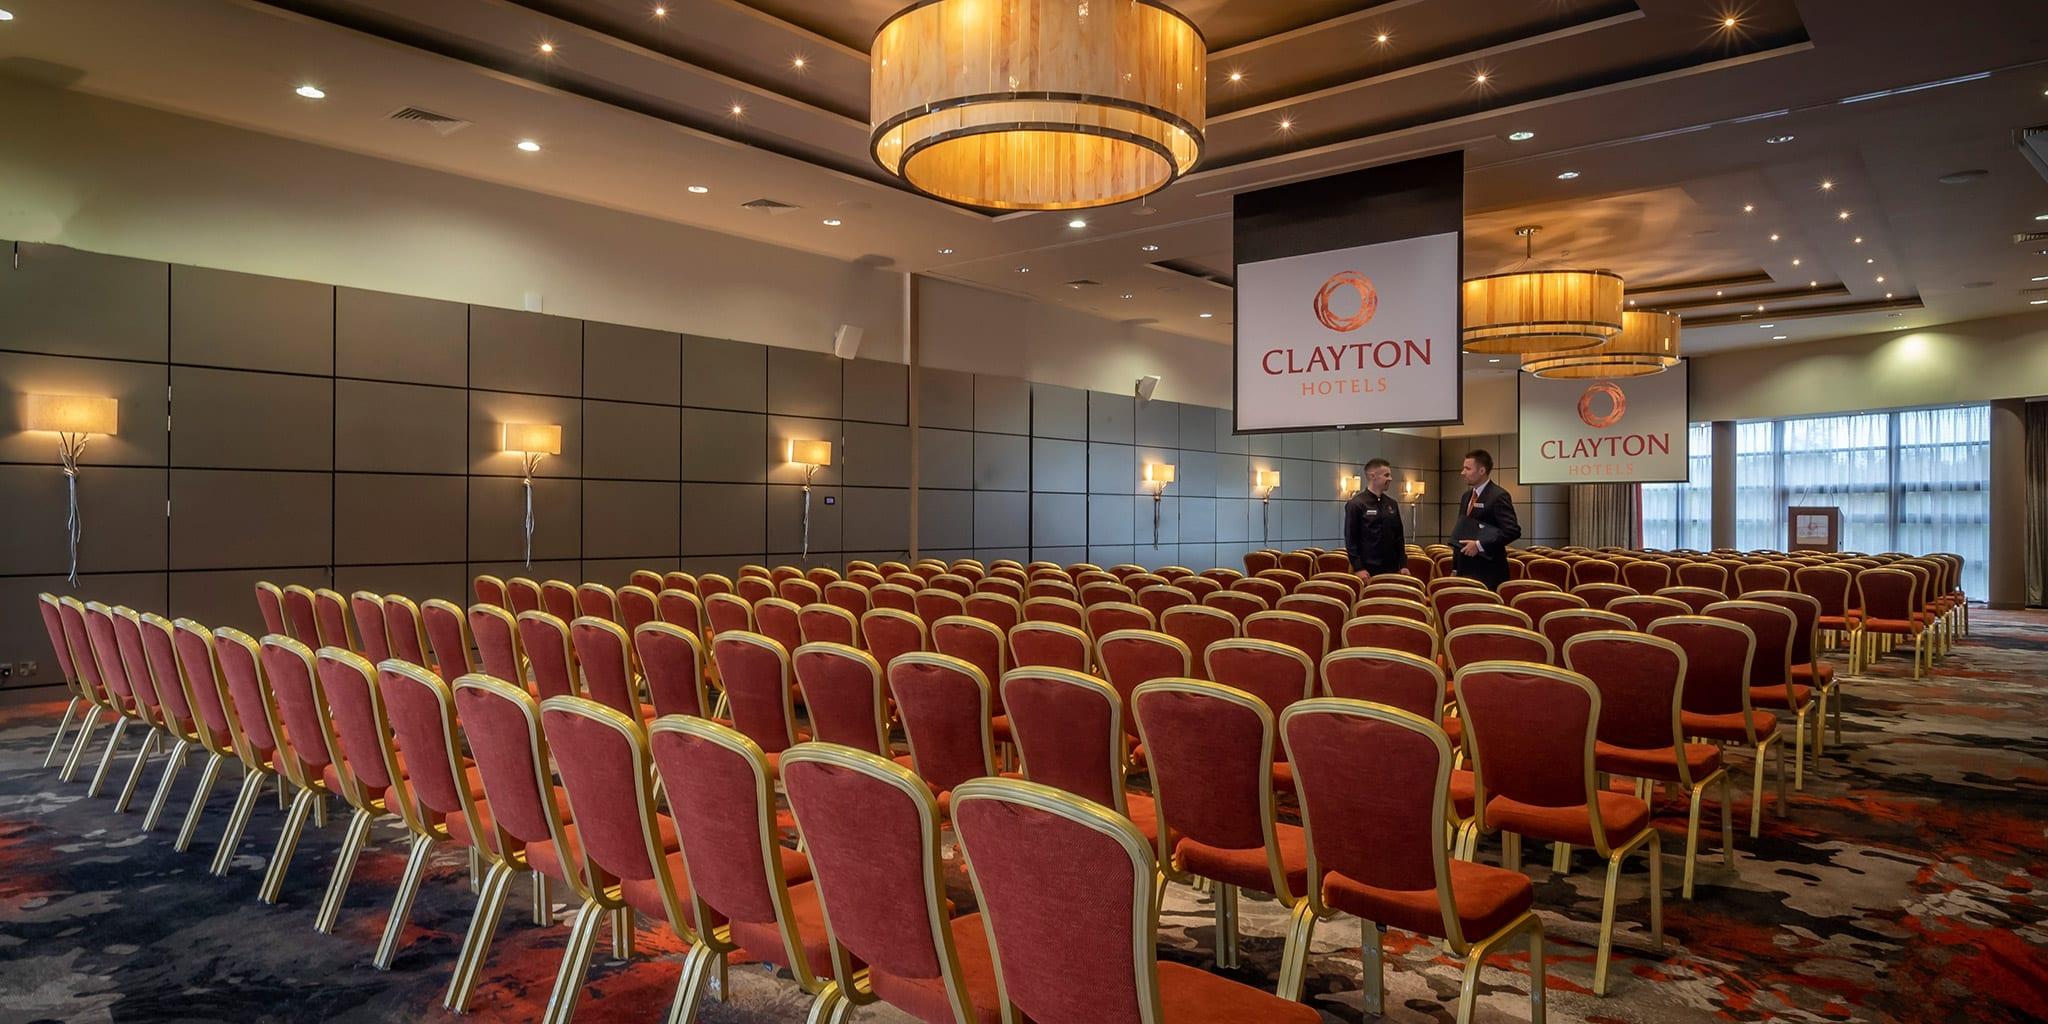 Clayton Hotel Liffey Valley - Home | Facebook